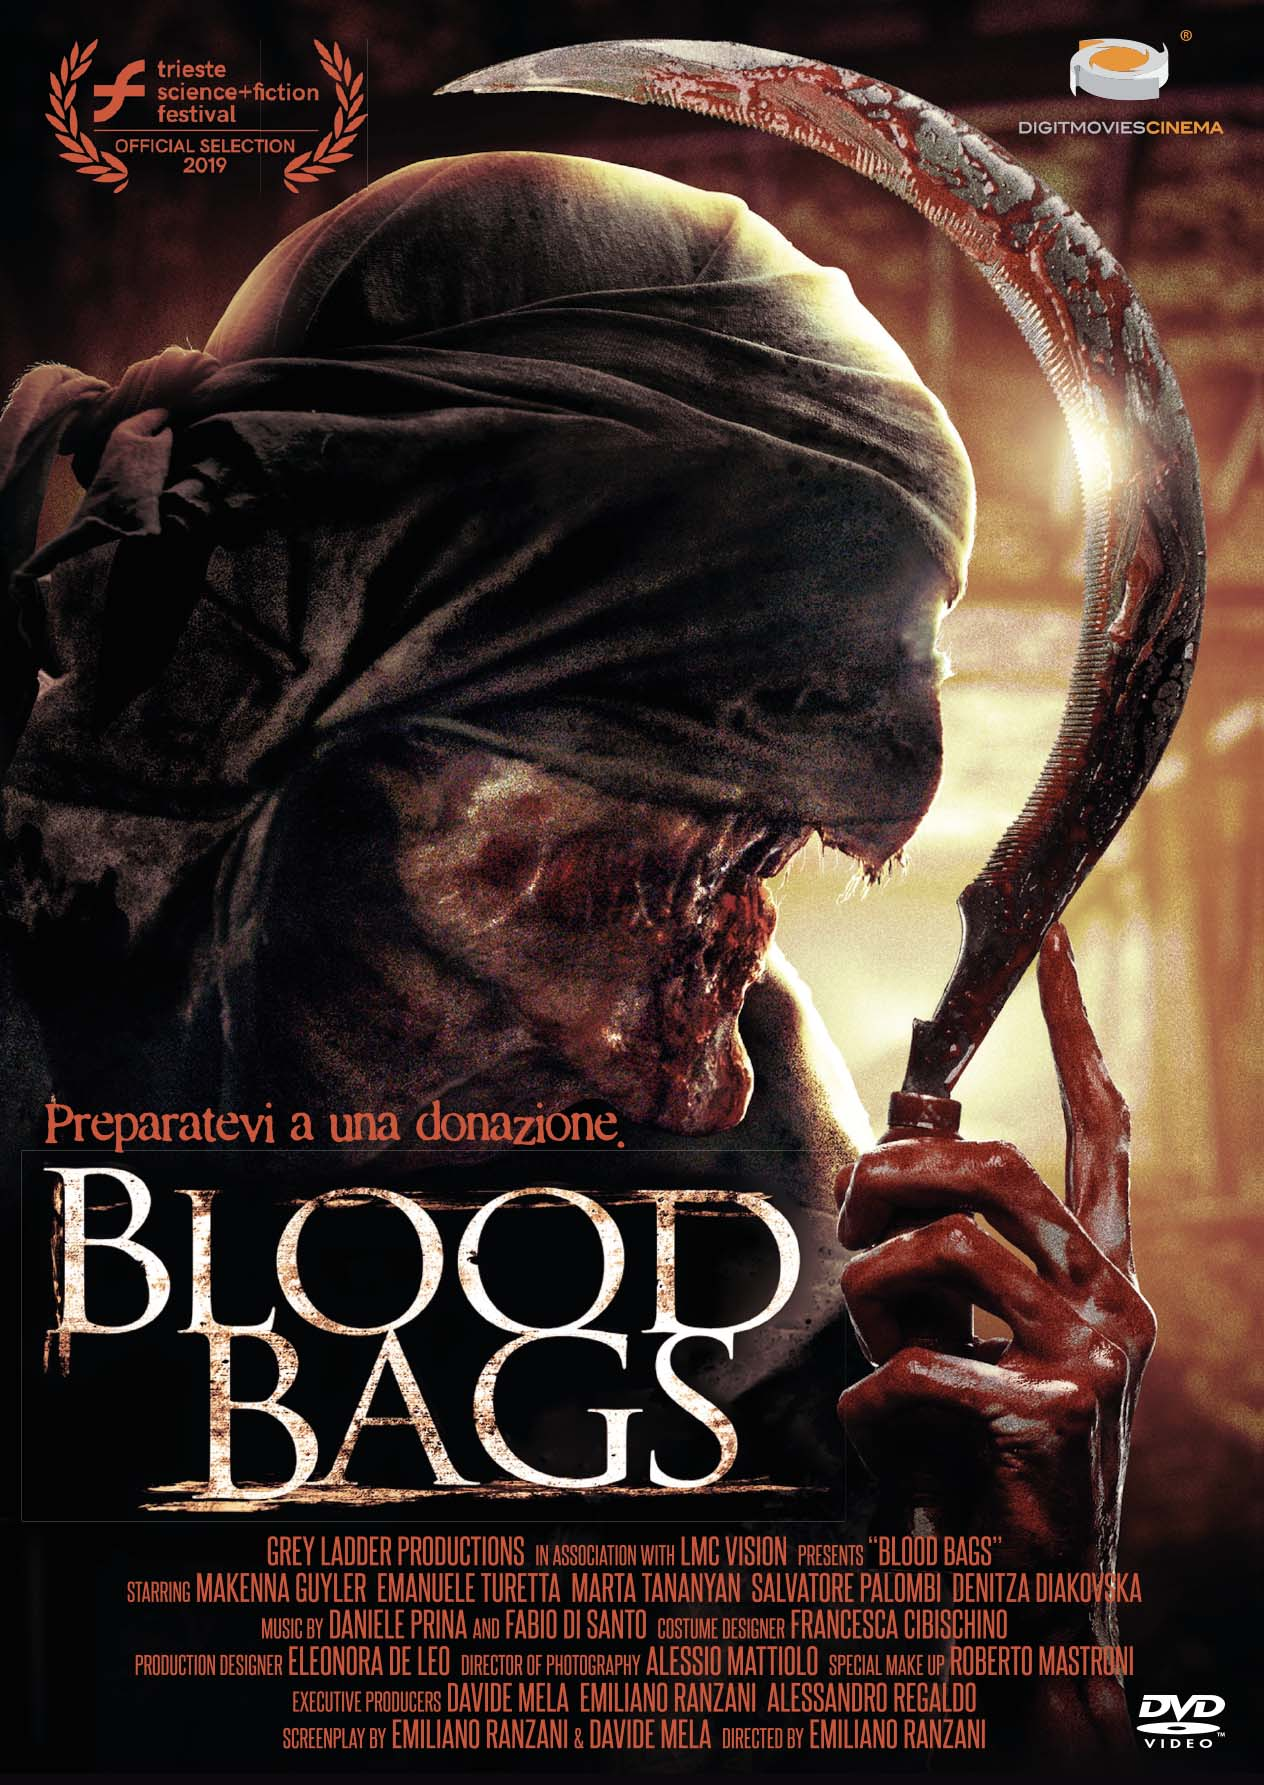 BLOOD BAGS (DVD)